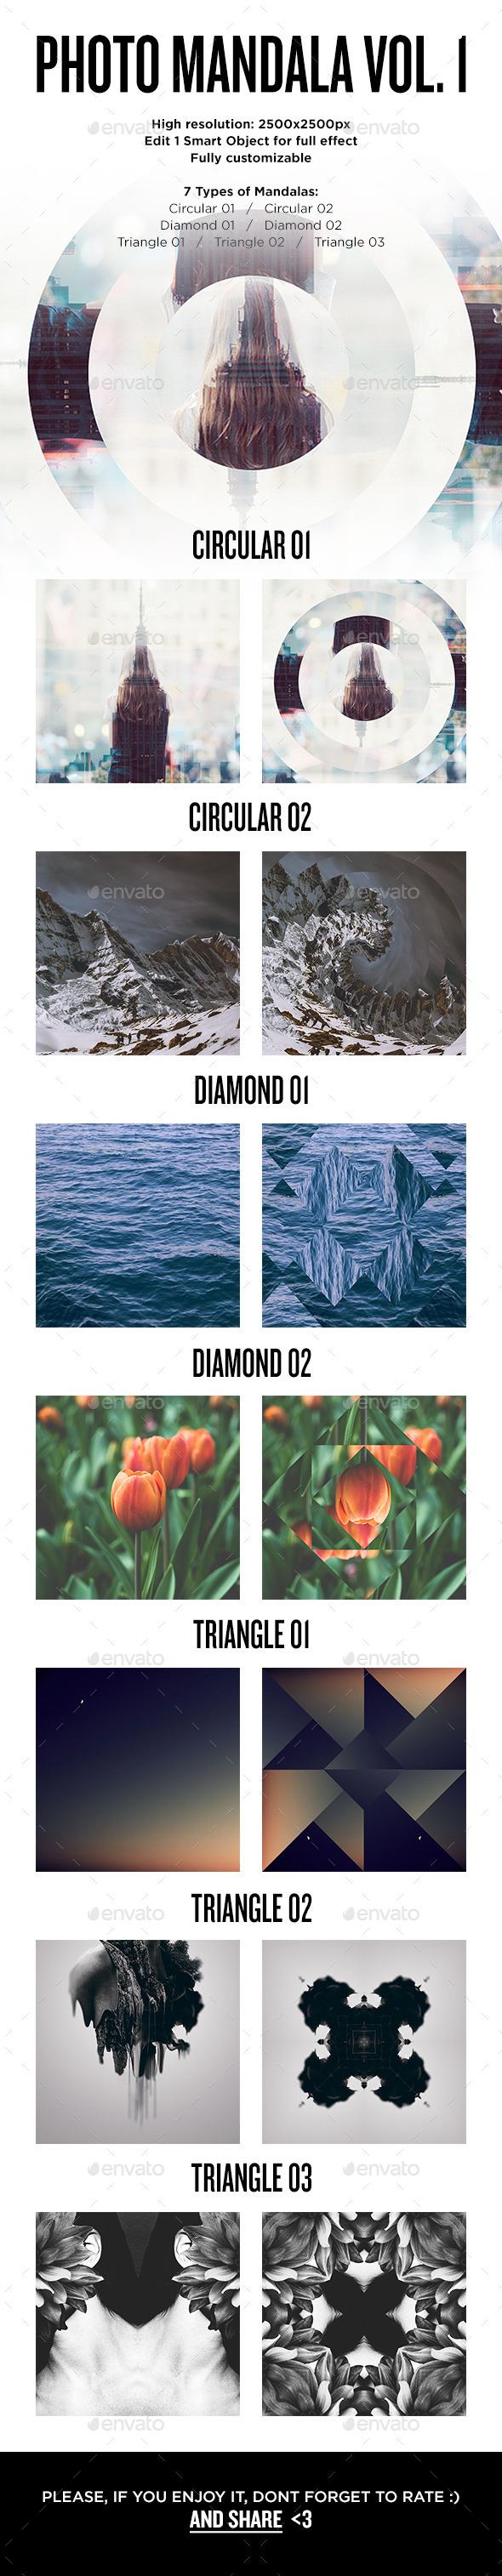 Photo Mandala Vol.1 - Kaleidoscope - Artistic Photo Templates